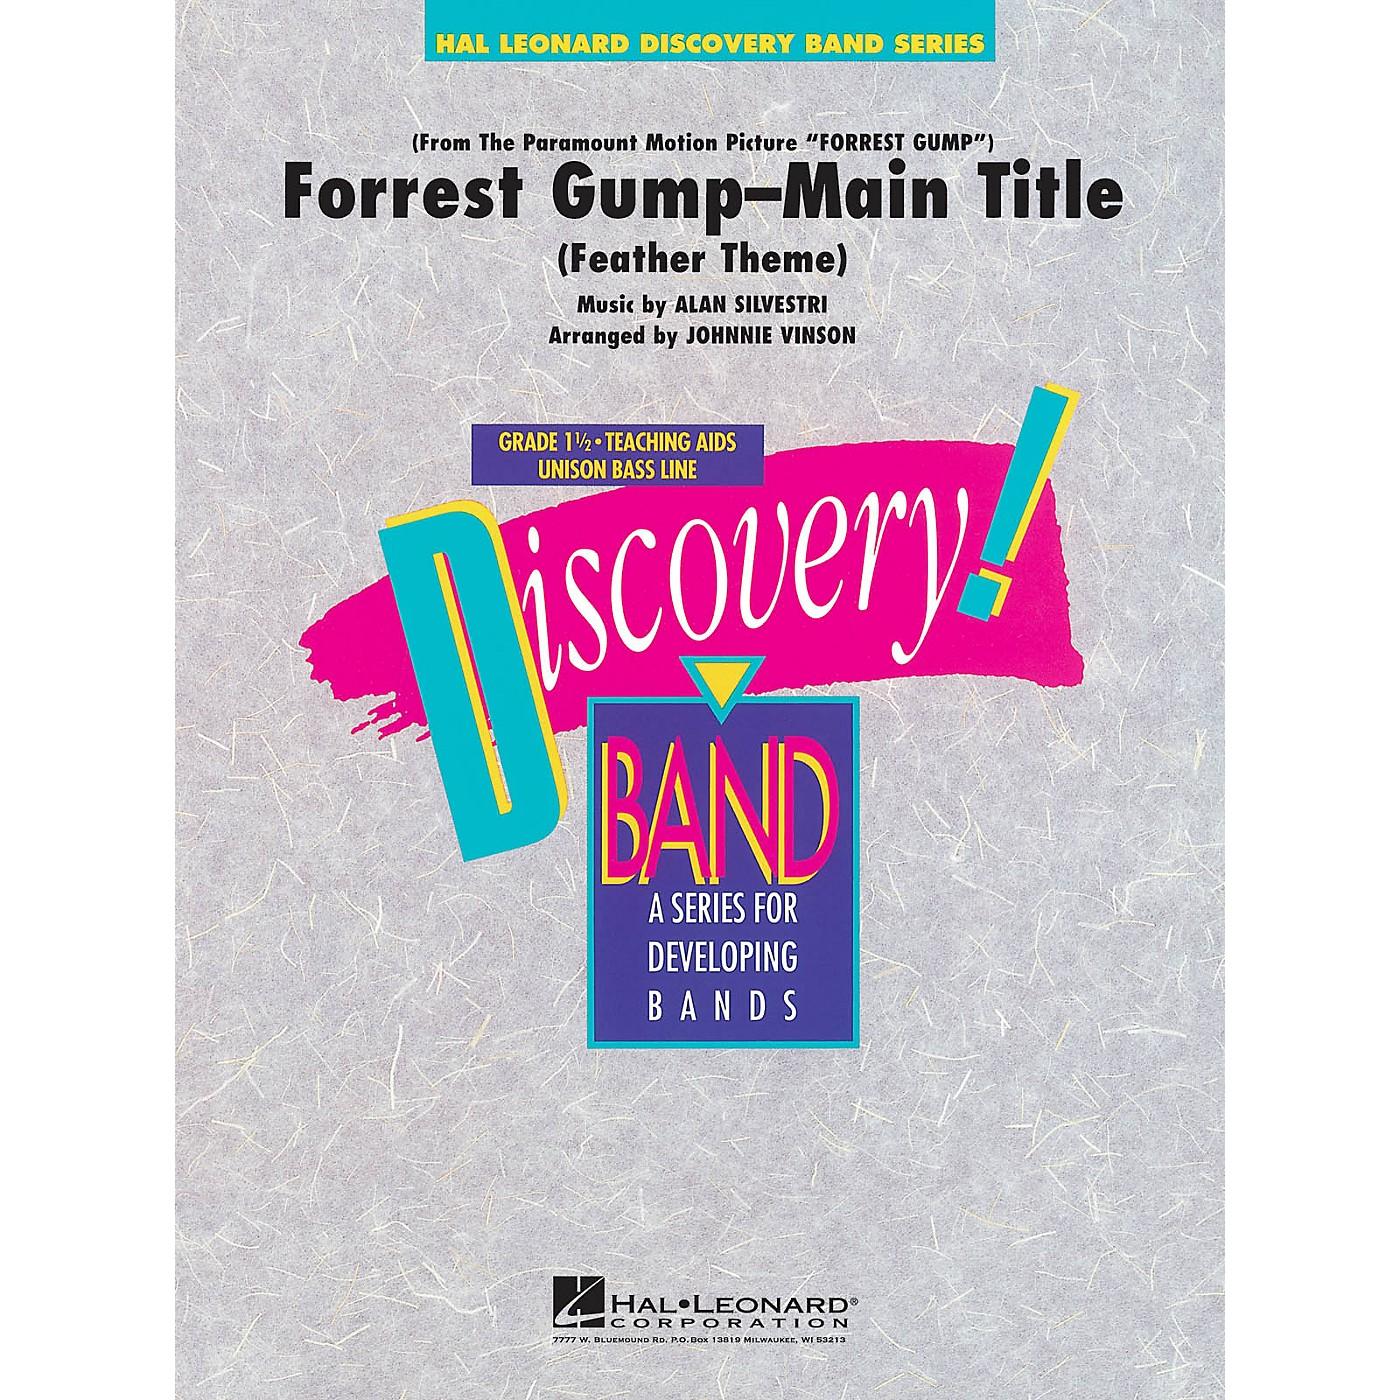 Hal Leonard Forrest Gump - Main Title Concert Band Level 1.5 Arranged by Johnnie Vinson thumbnail